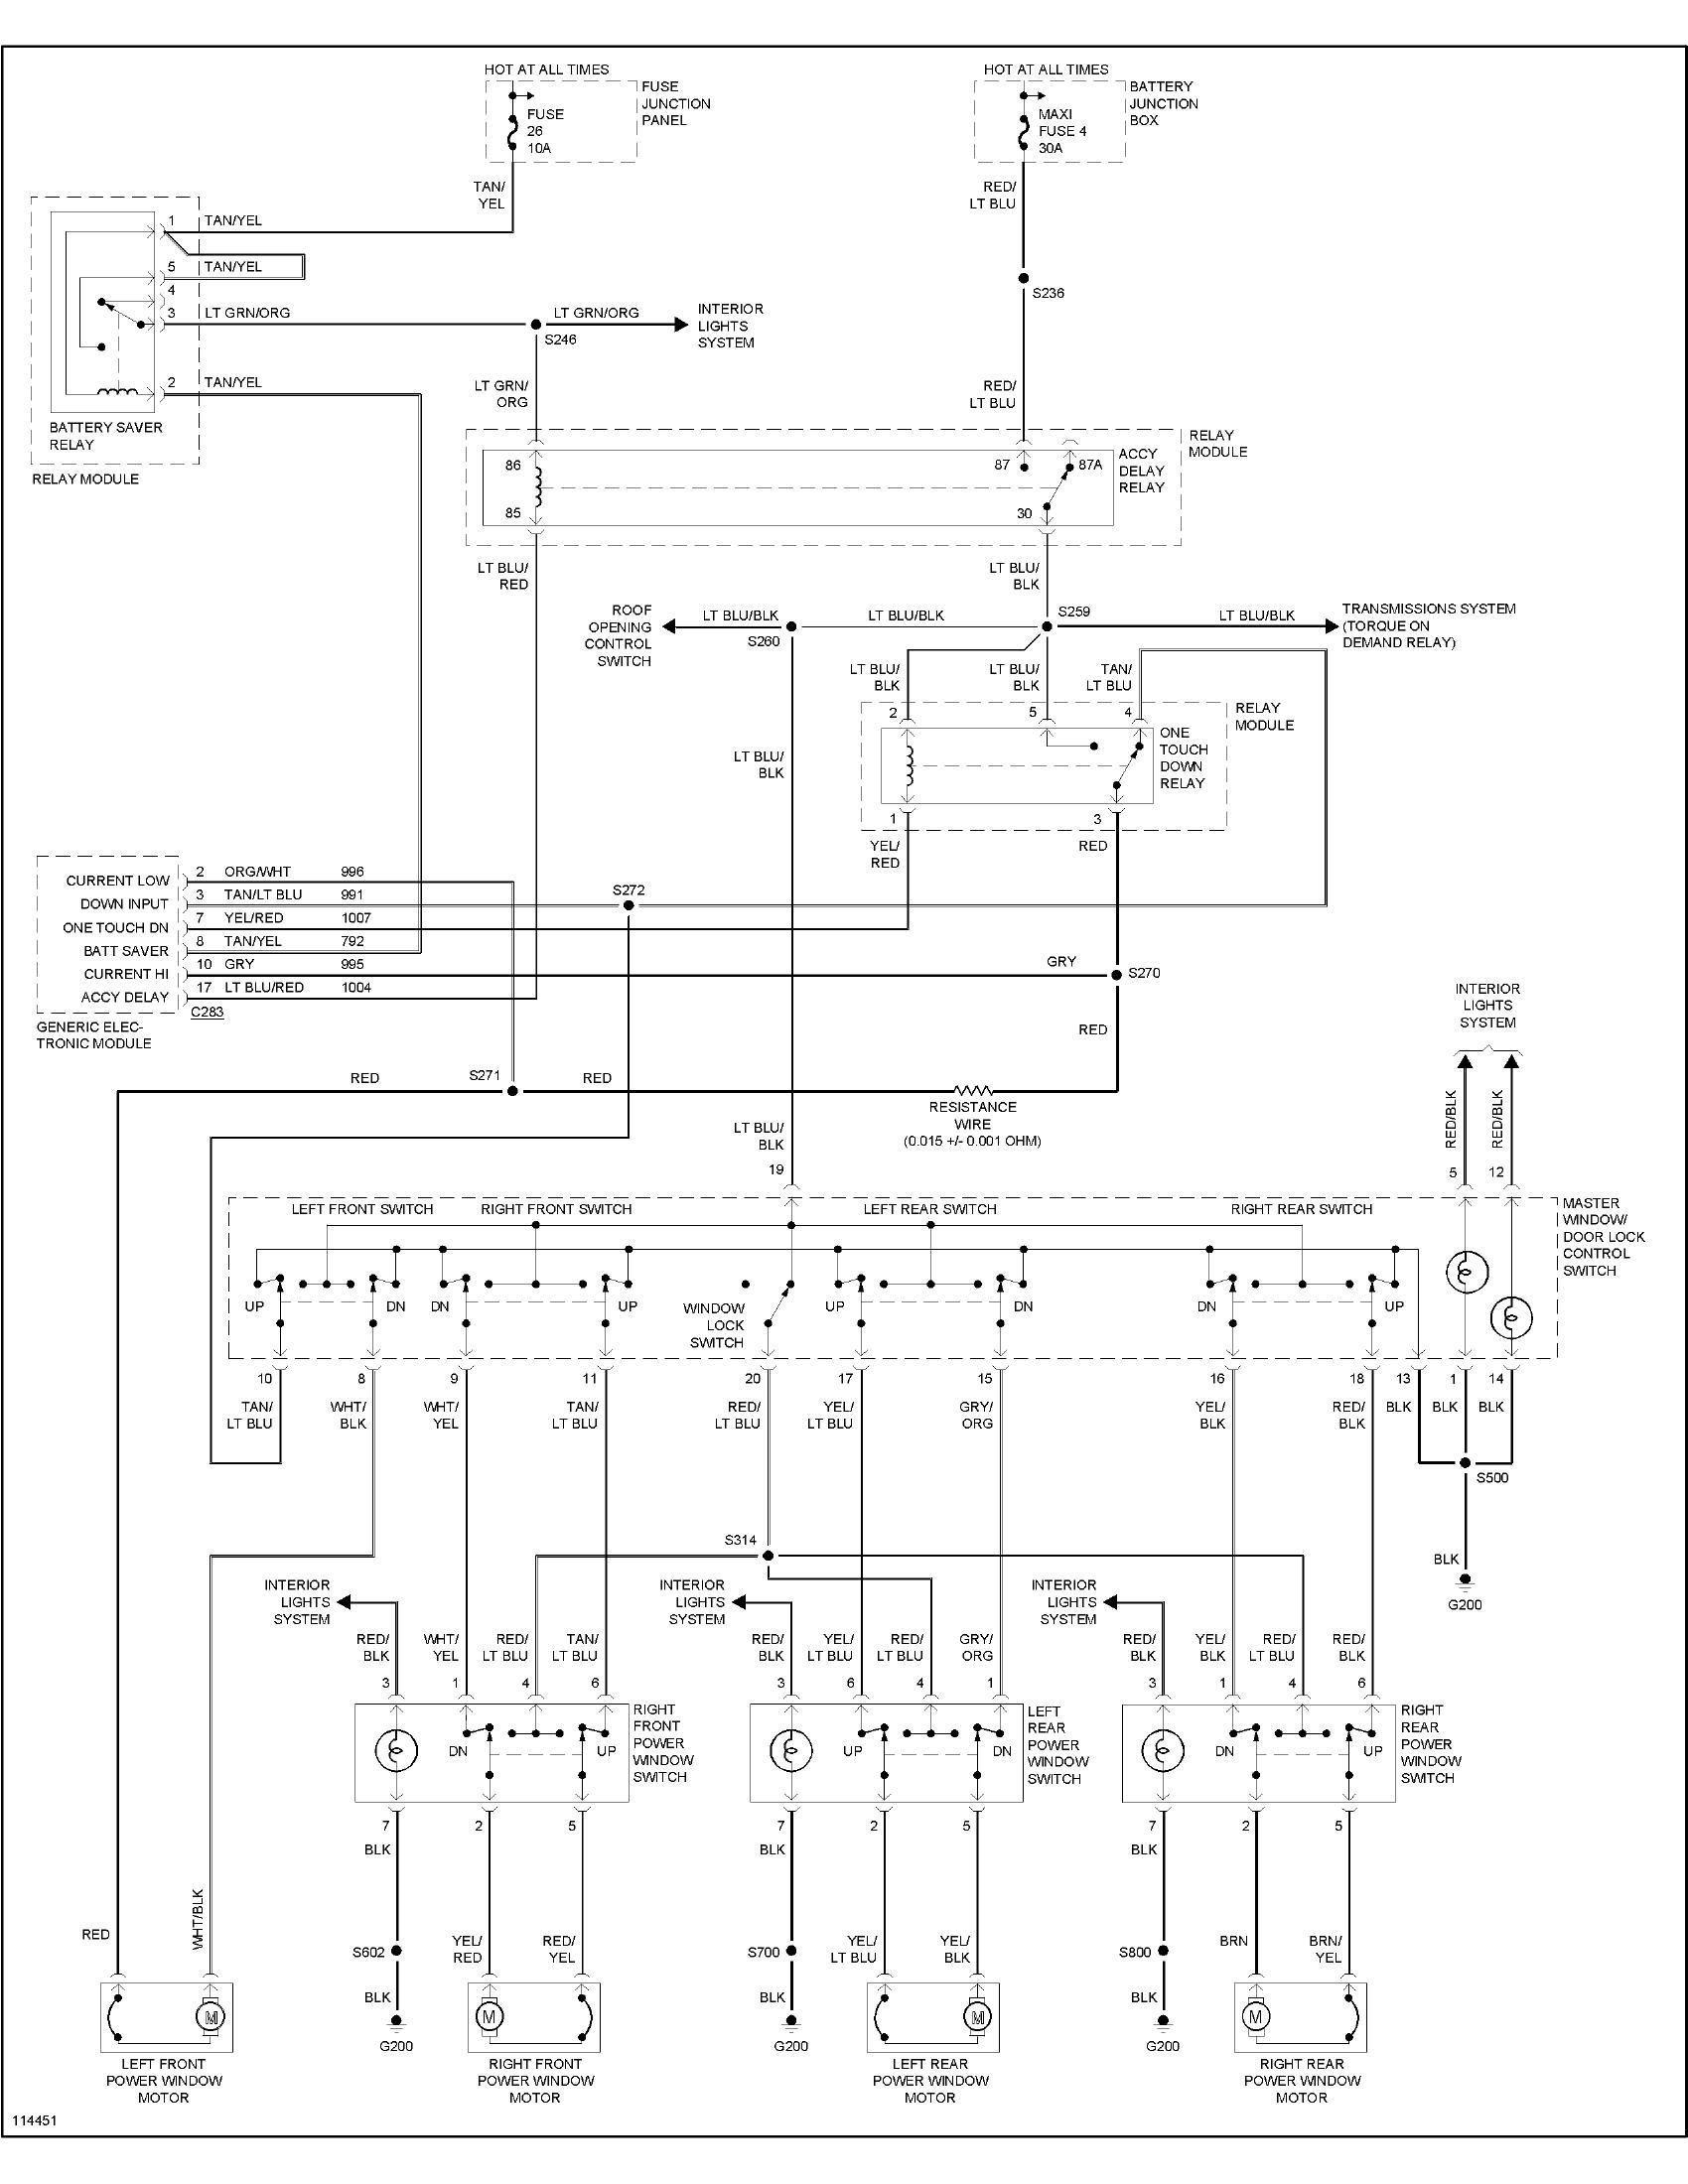 1999 ford expedition xlt wiring diagram - wiring diagram system crew-locate  - crew-locate.ediliadesign.it  ediliadesign.it